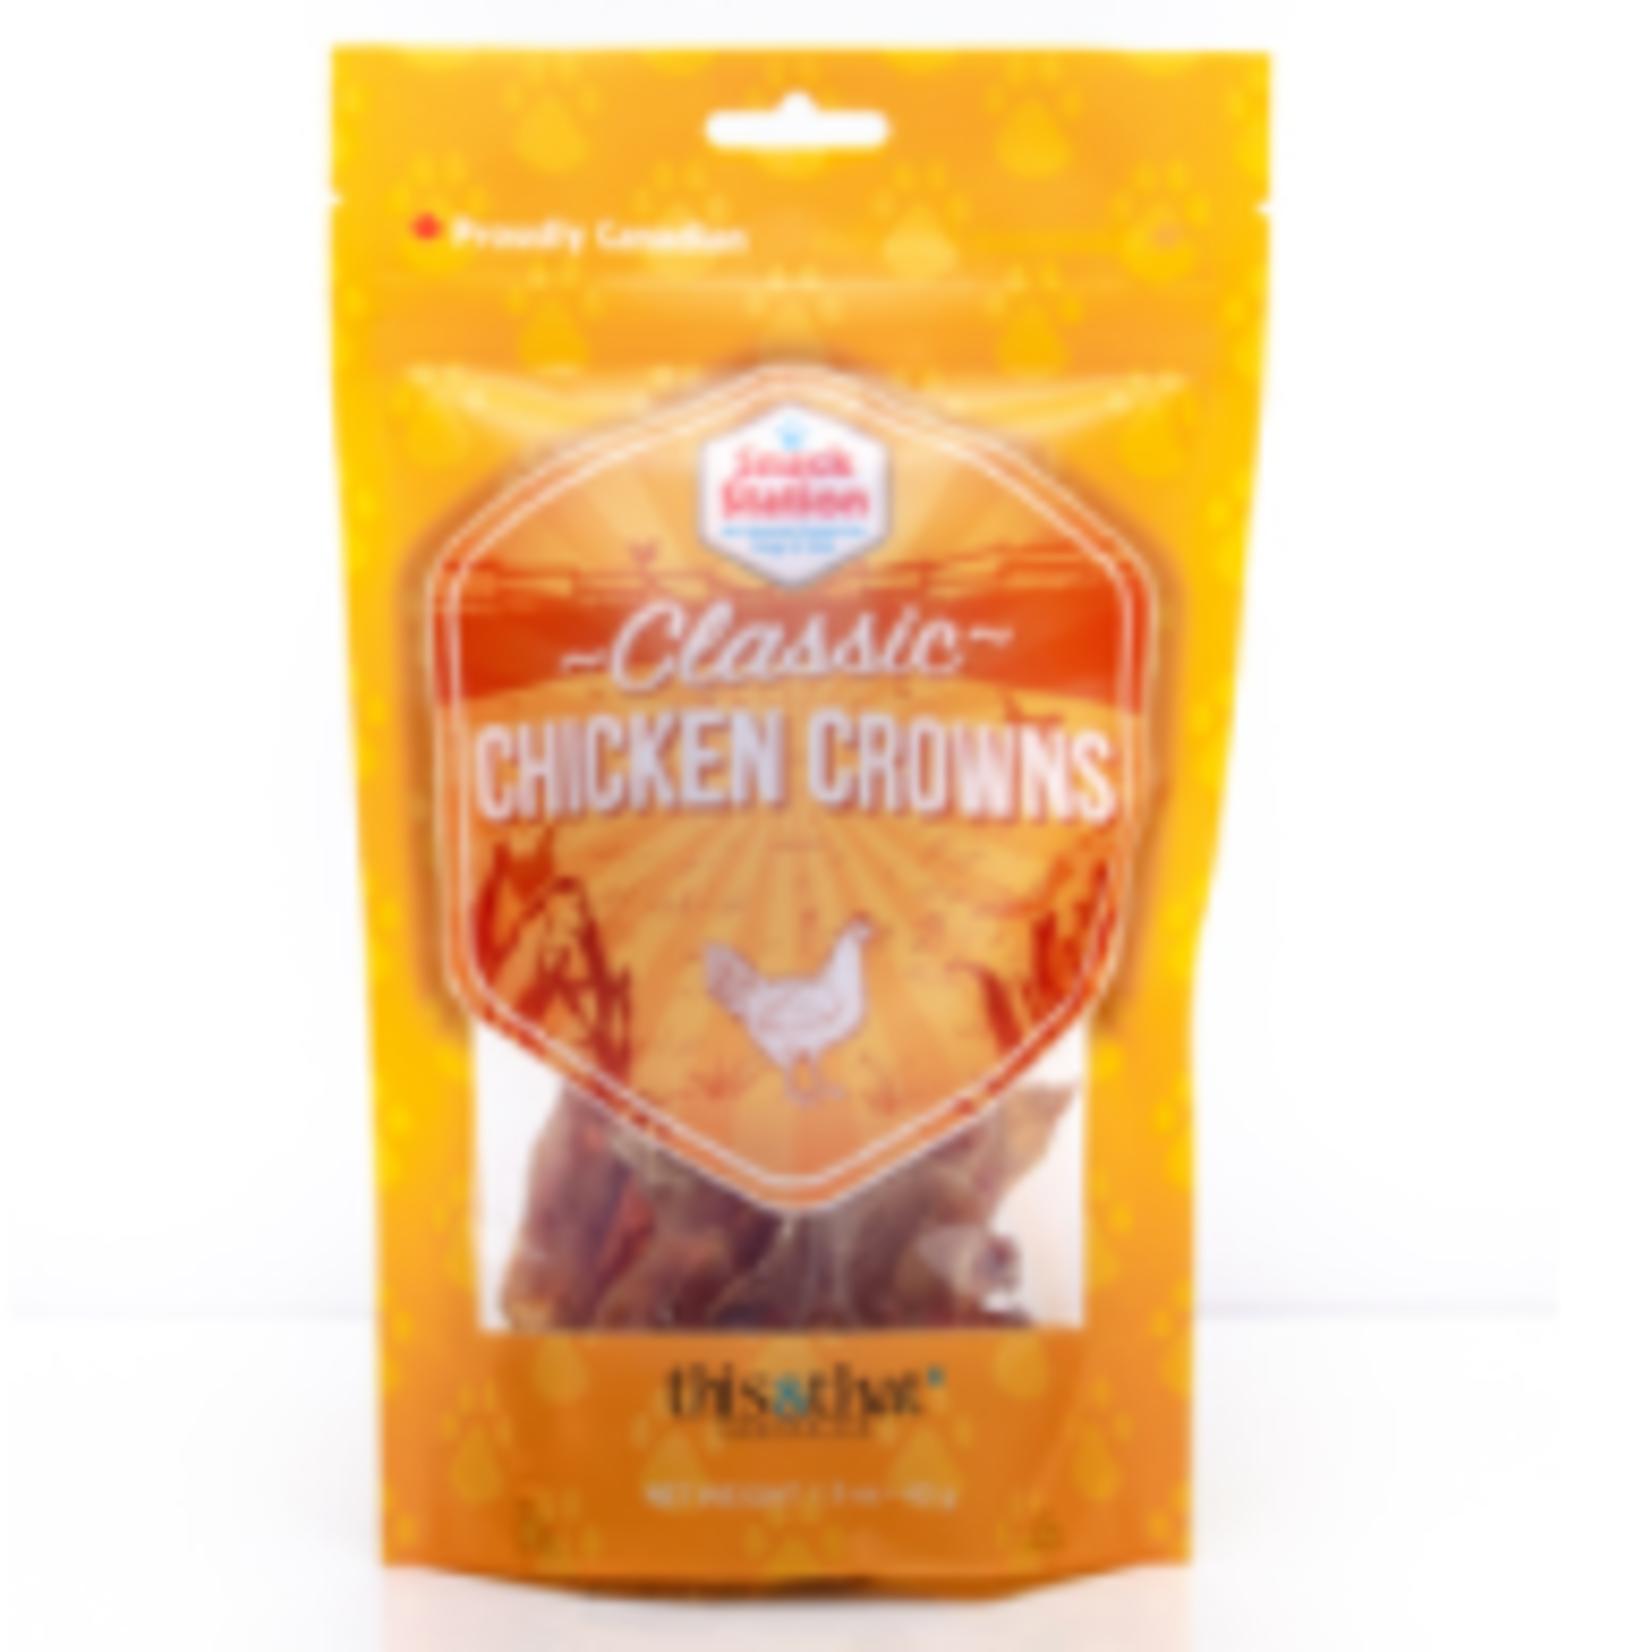 This & That Chicken Crowns 43g